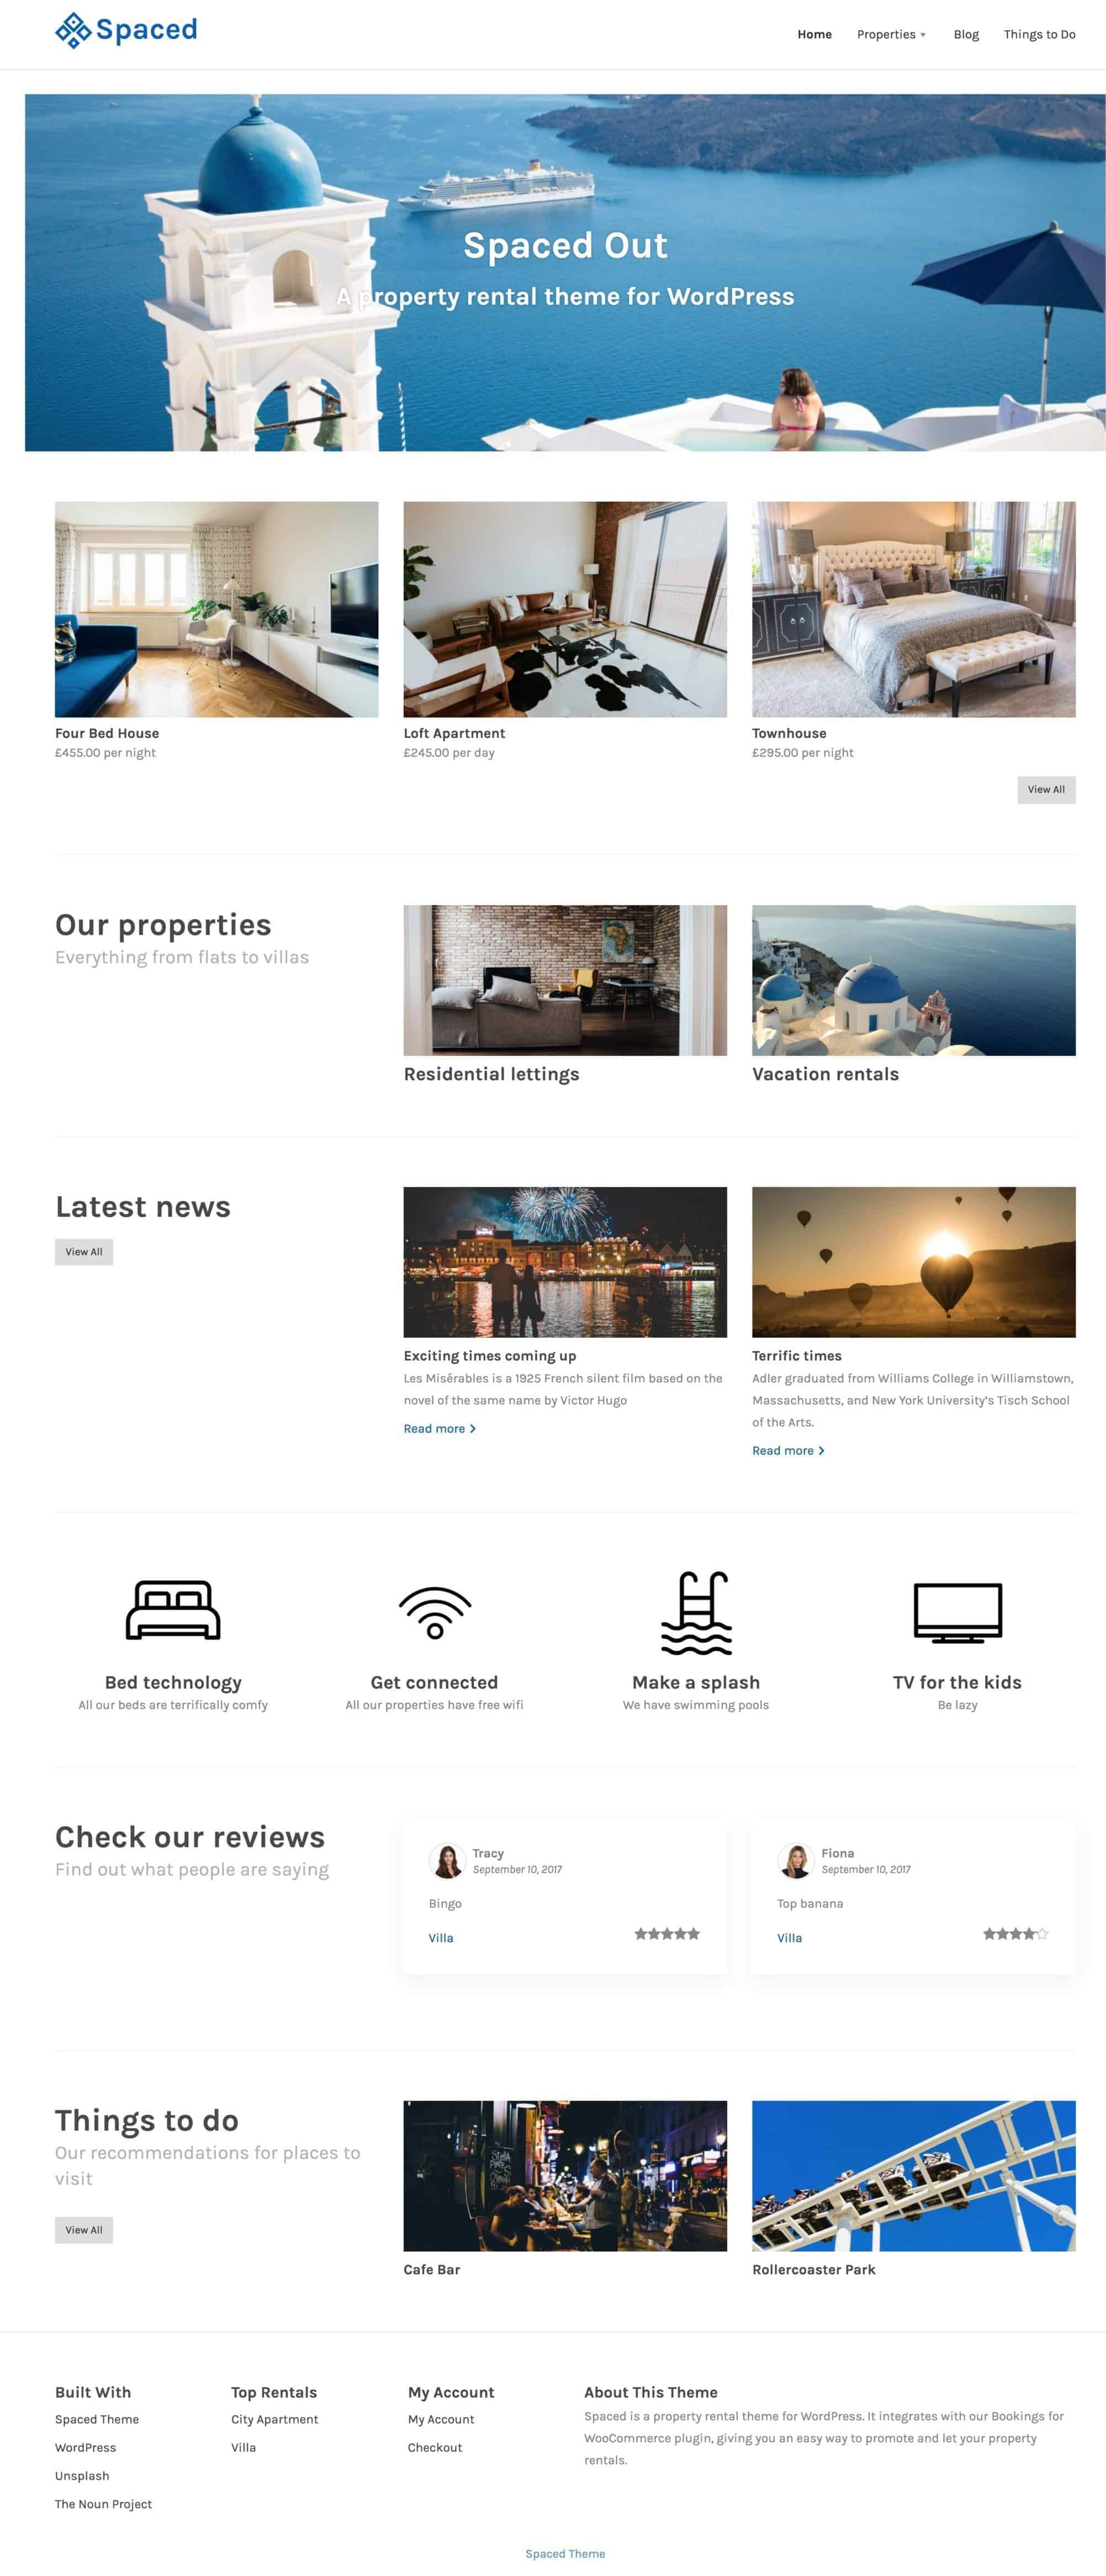 Property rental theme for WordPress